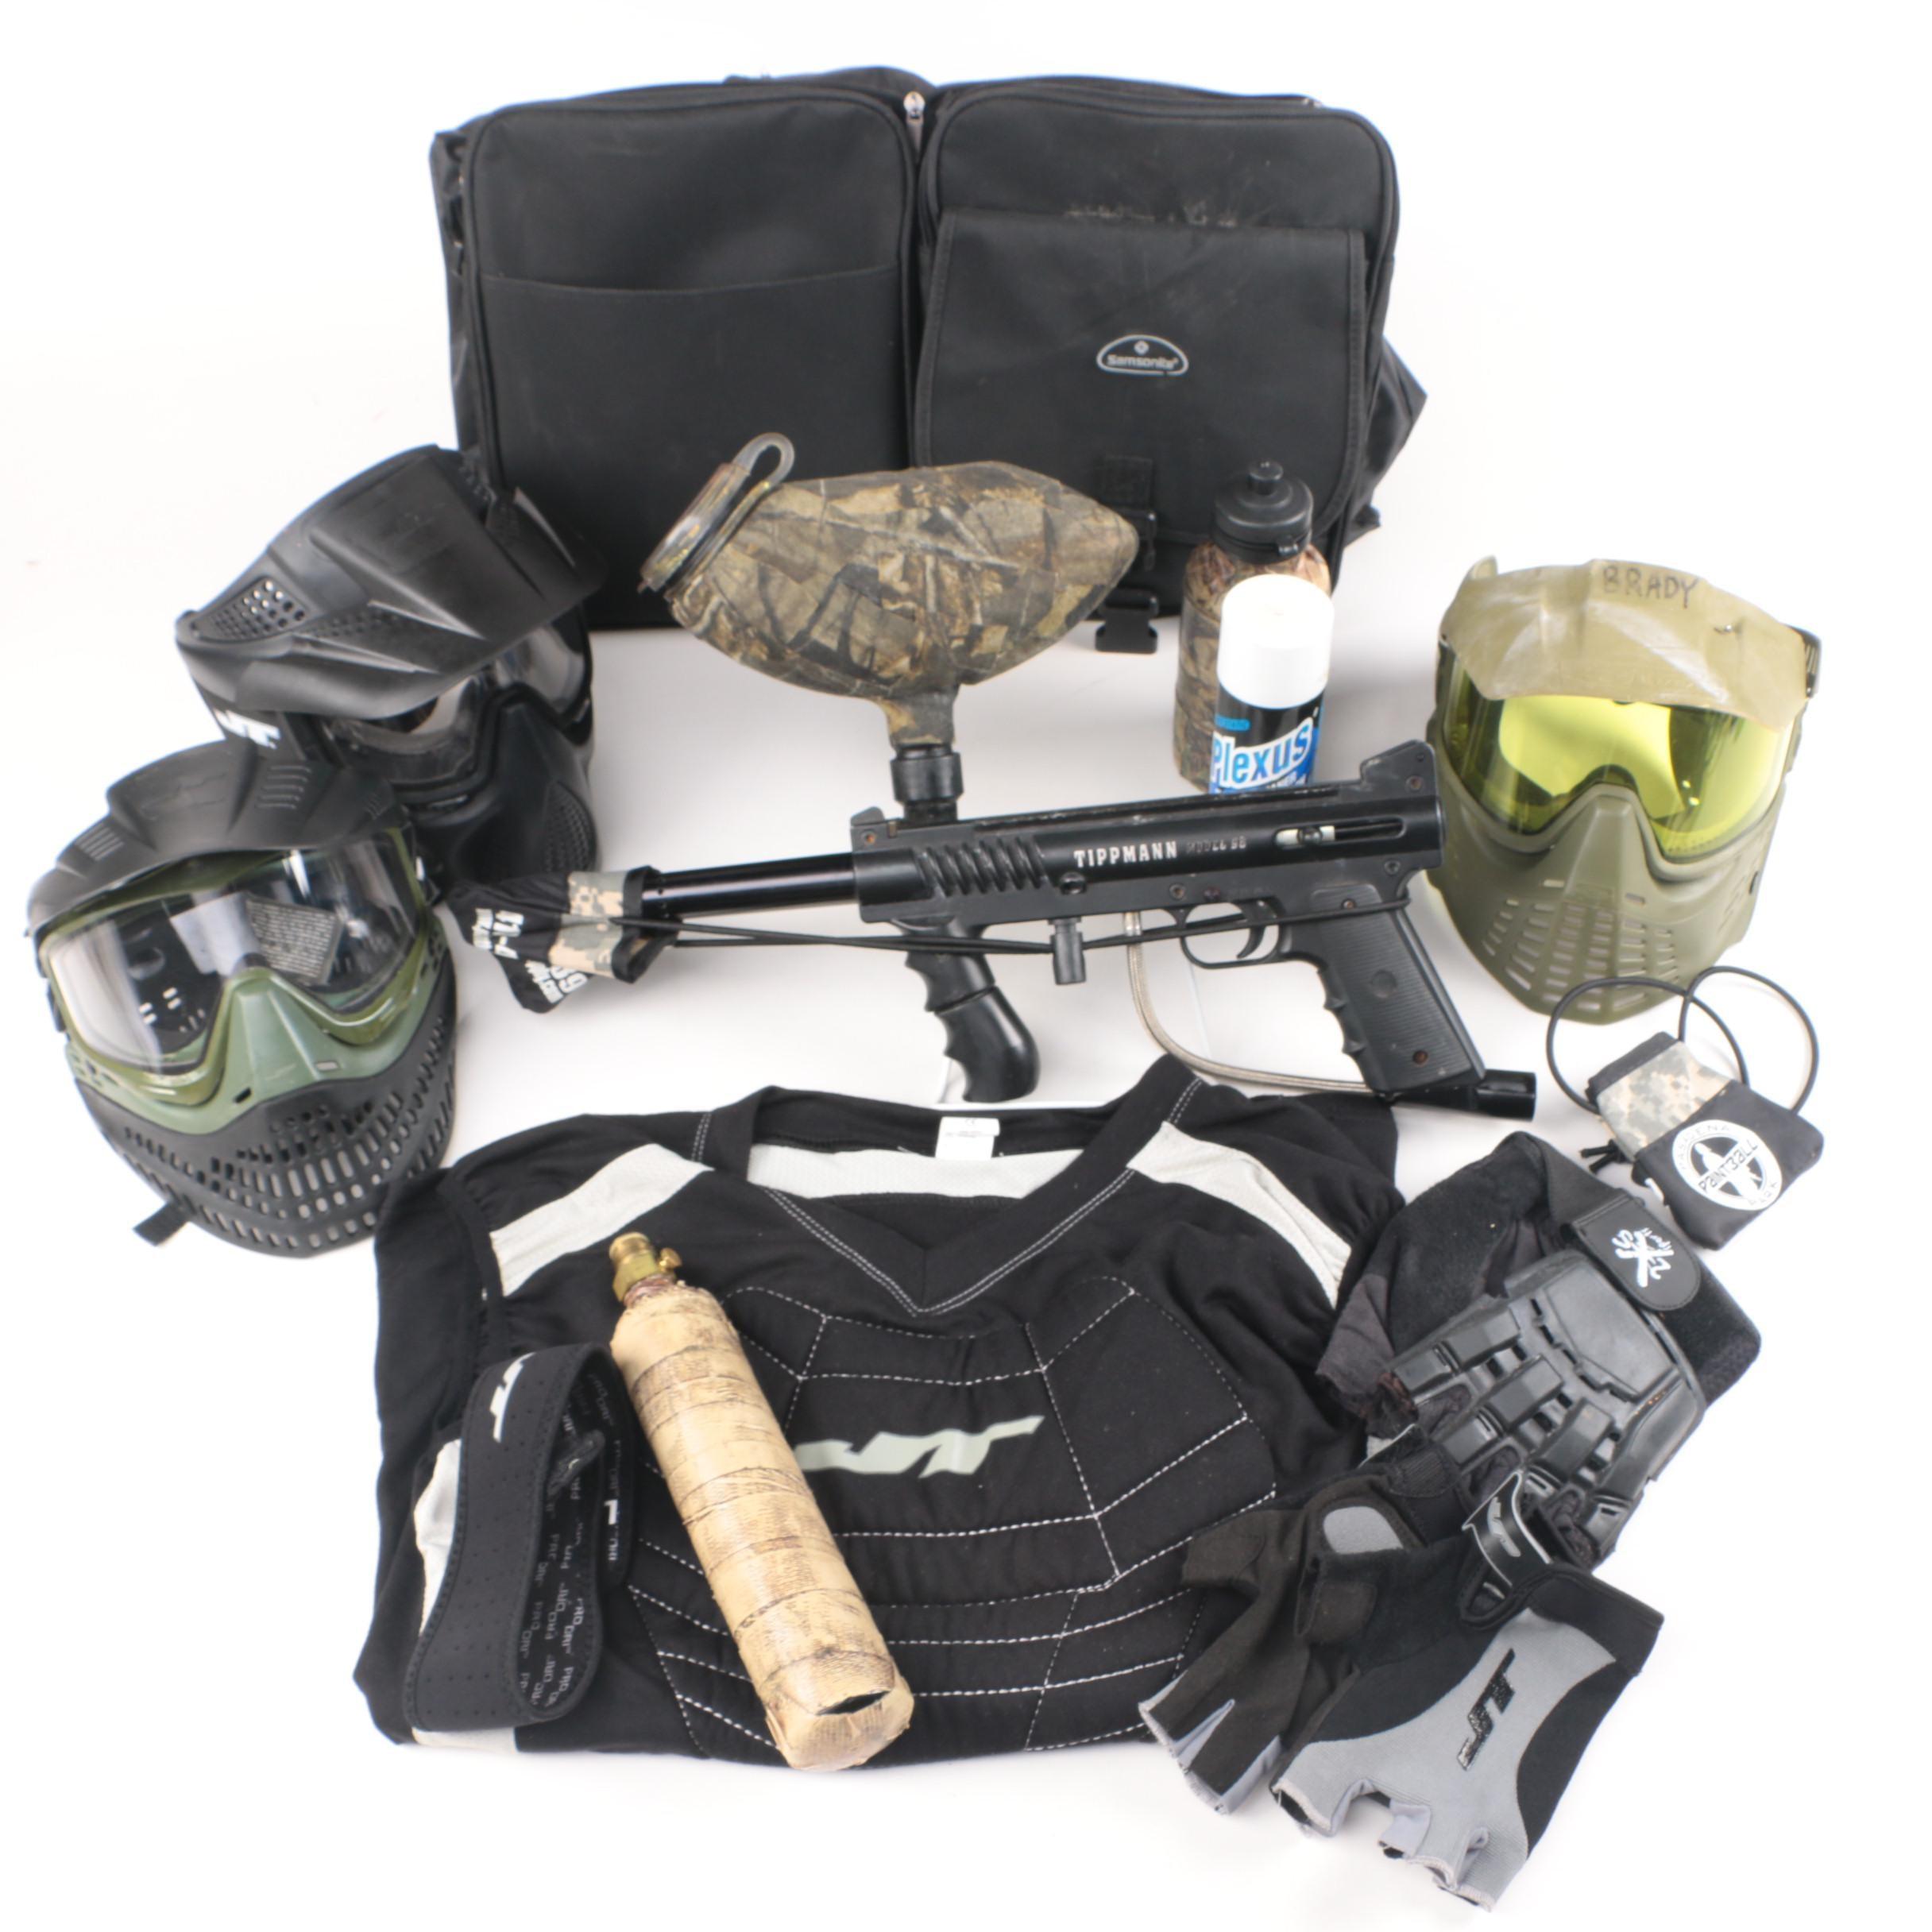 Tippman Paintball Gun and Accessories